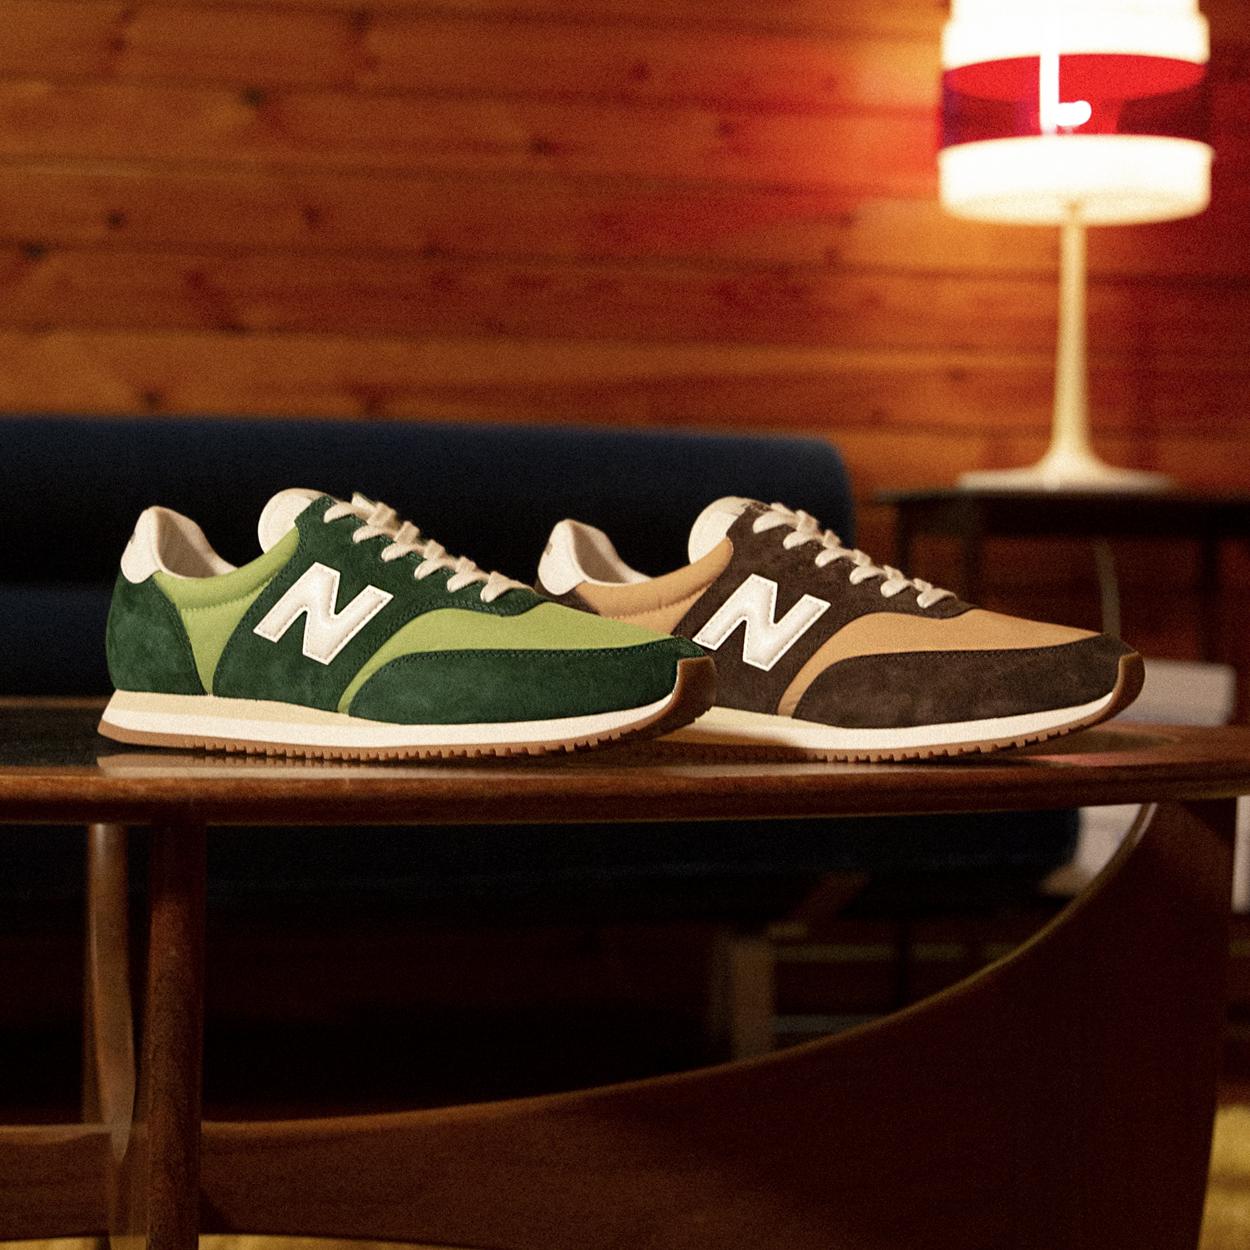 New Balance Comp 100 green and brown